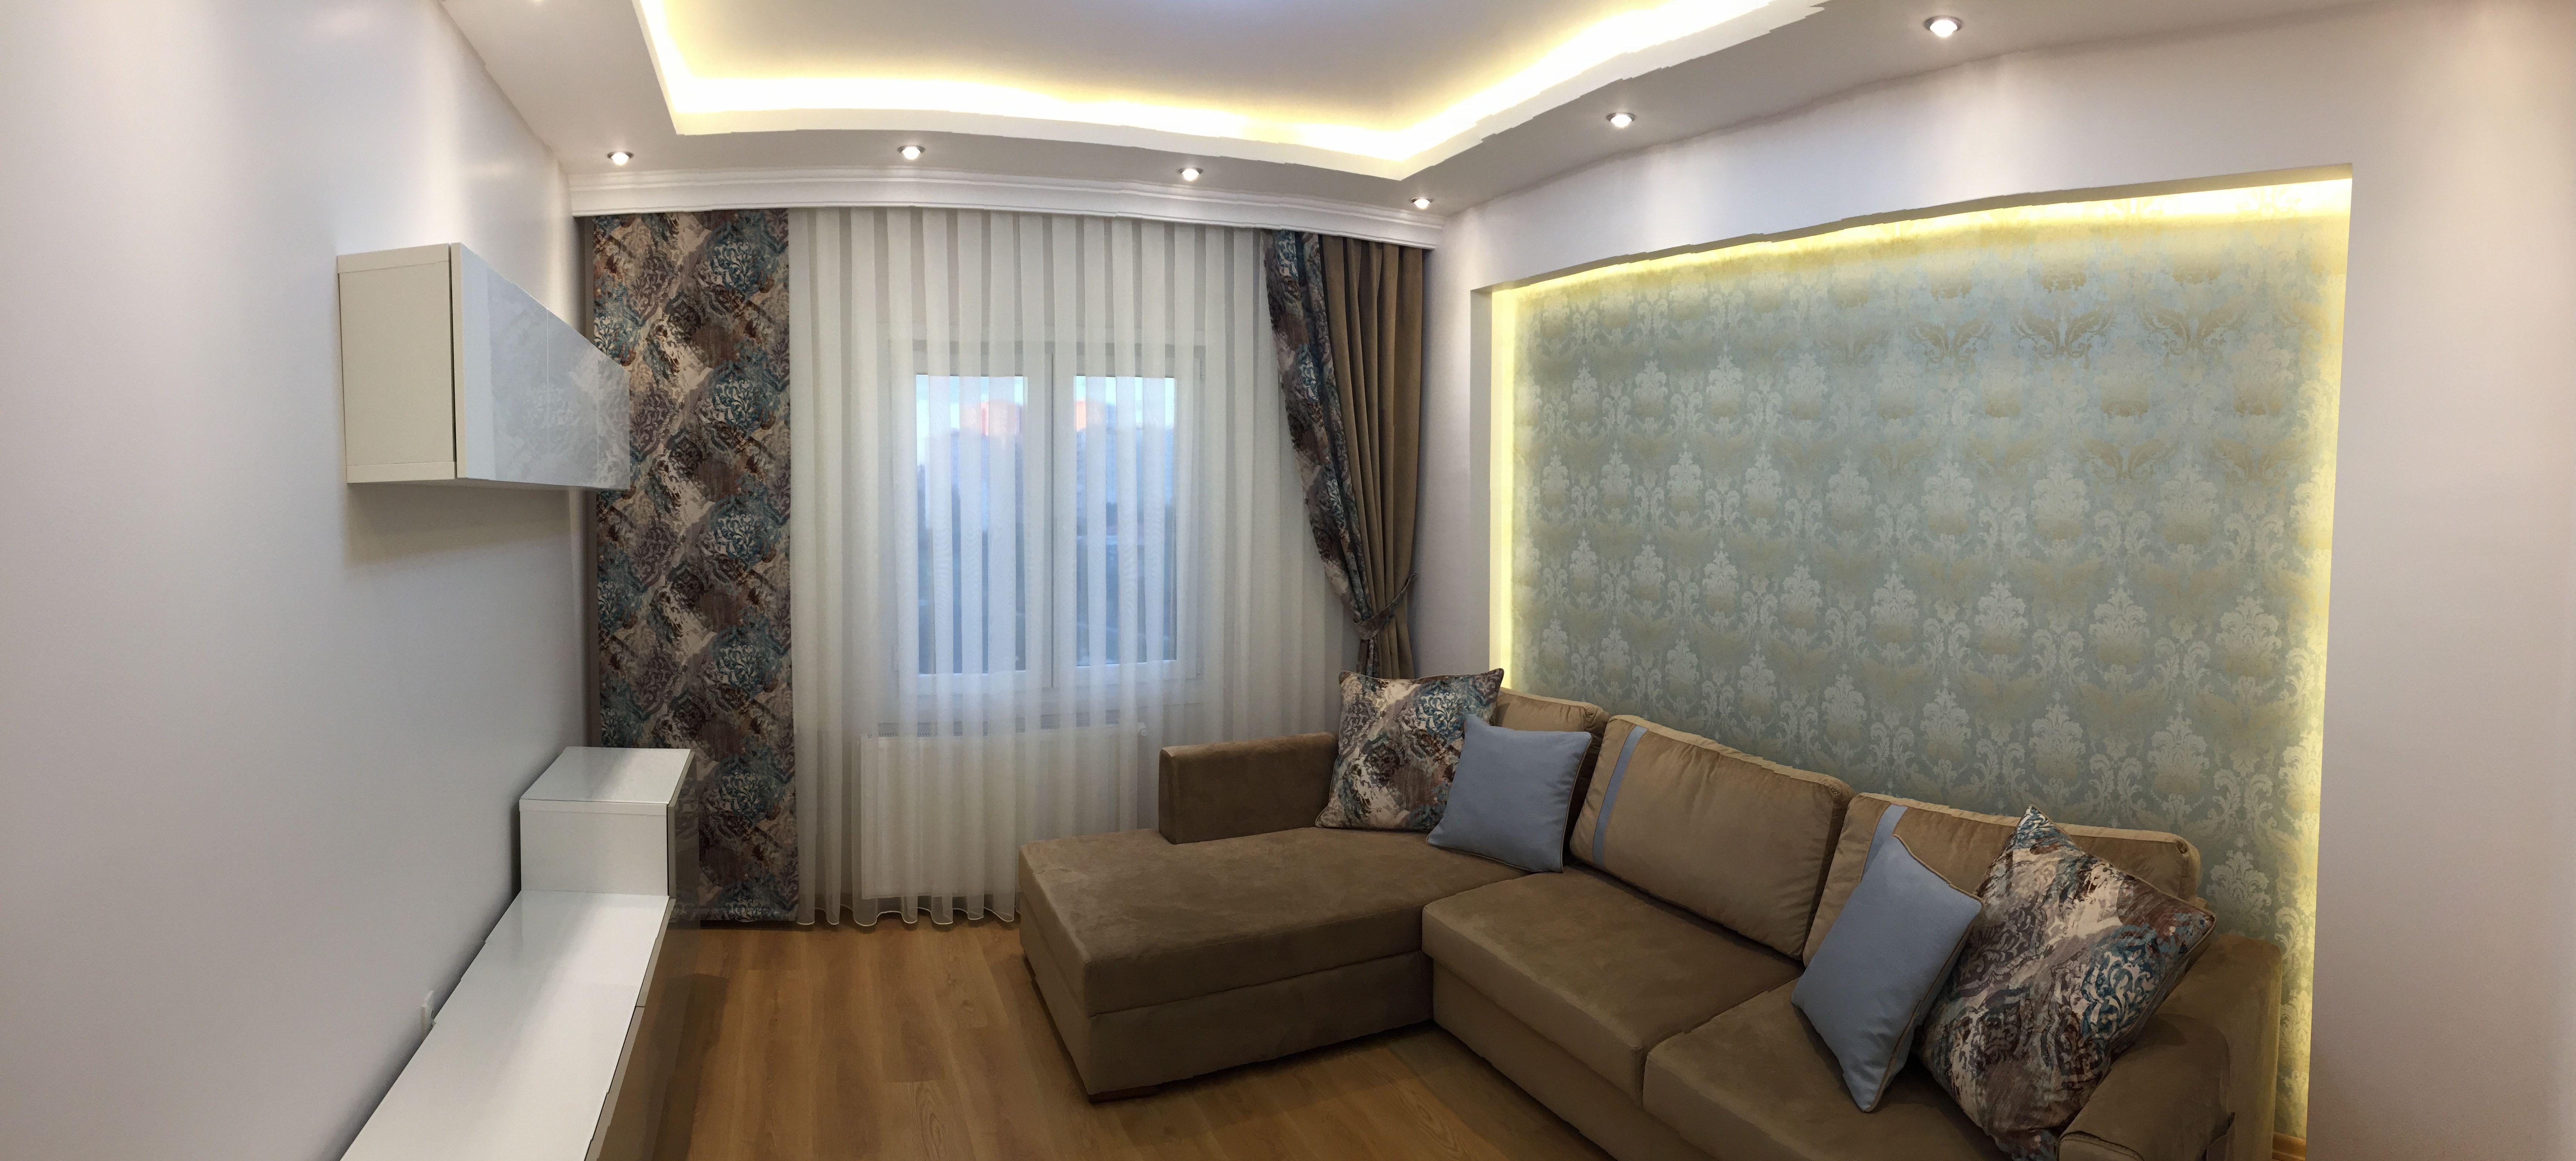 Oturma Odasi Dekorasyonu Yasam Alani Kose Koltuk Takimi Tv Unitesi Sik Ozel Tasarim Sandalye Modern Otu Living Spaces Home Decor Interior And Exterior